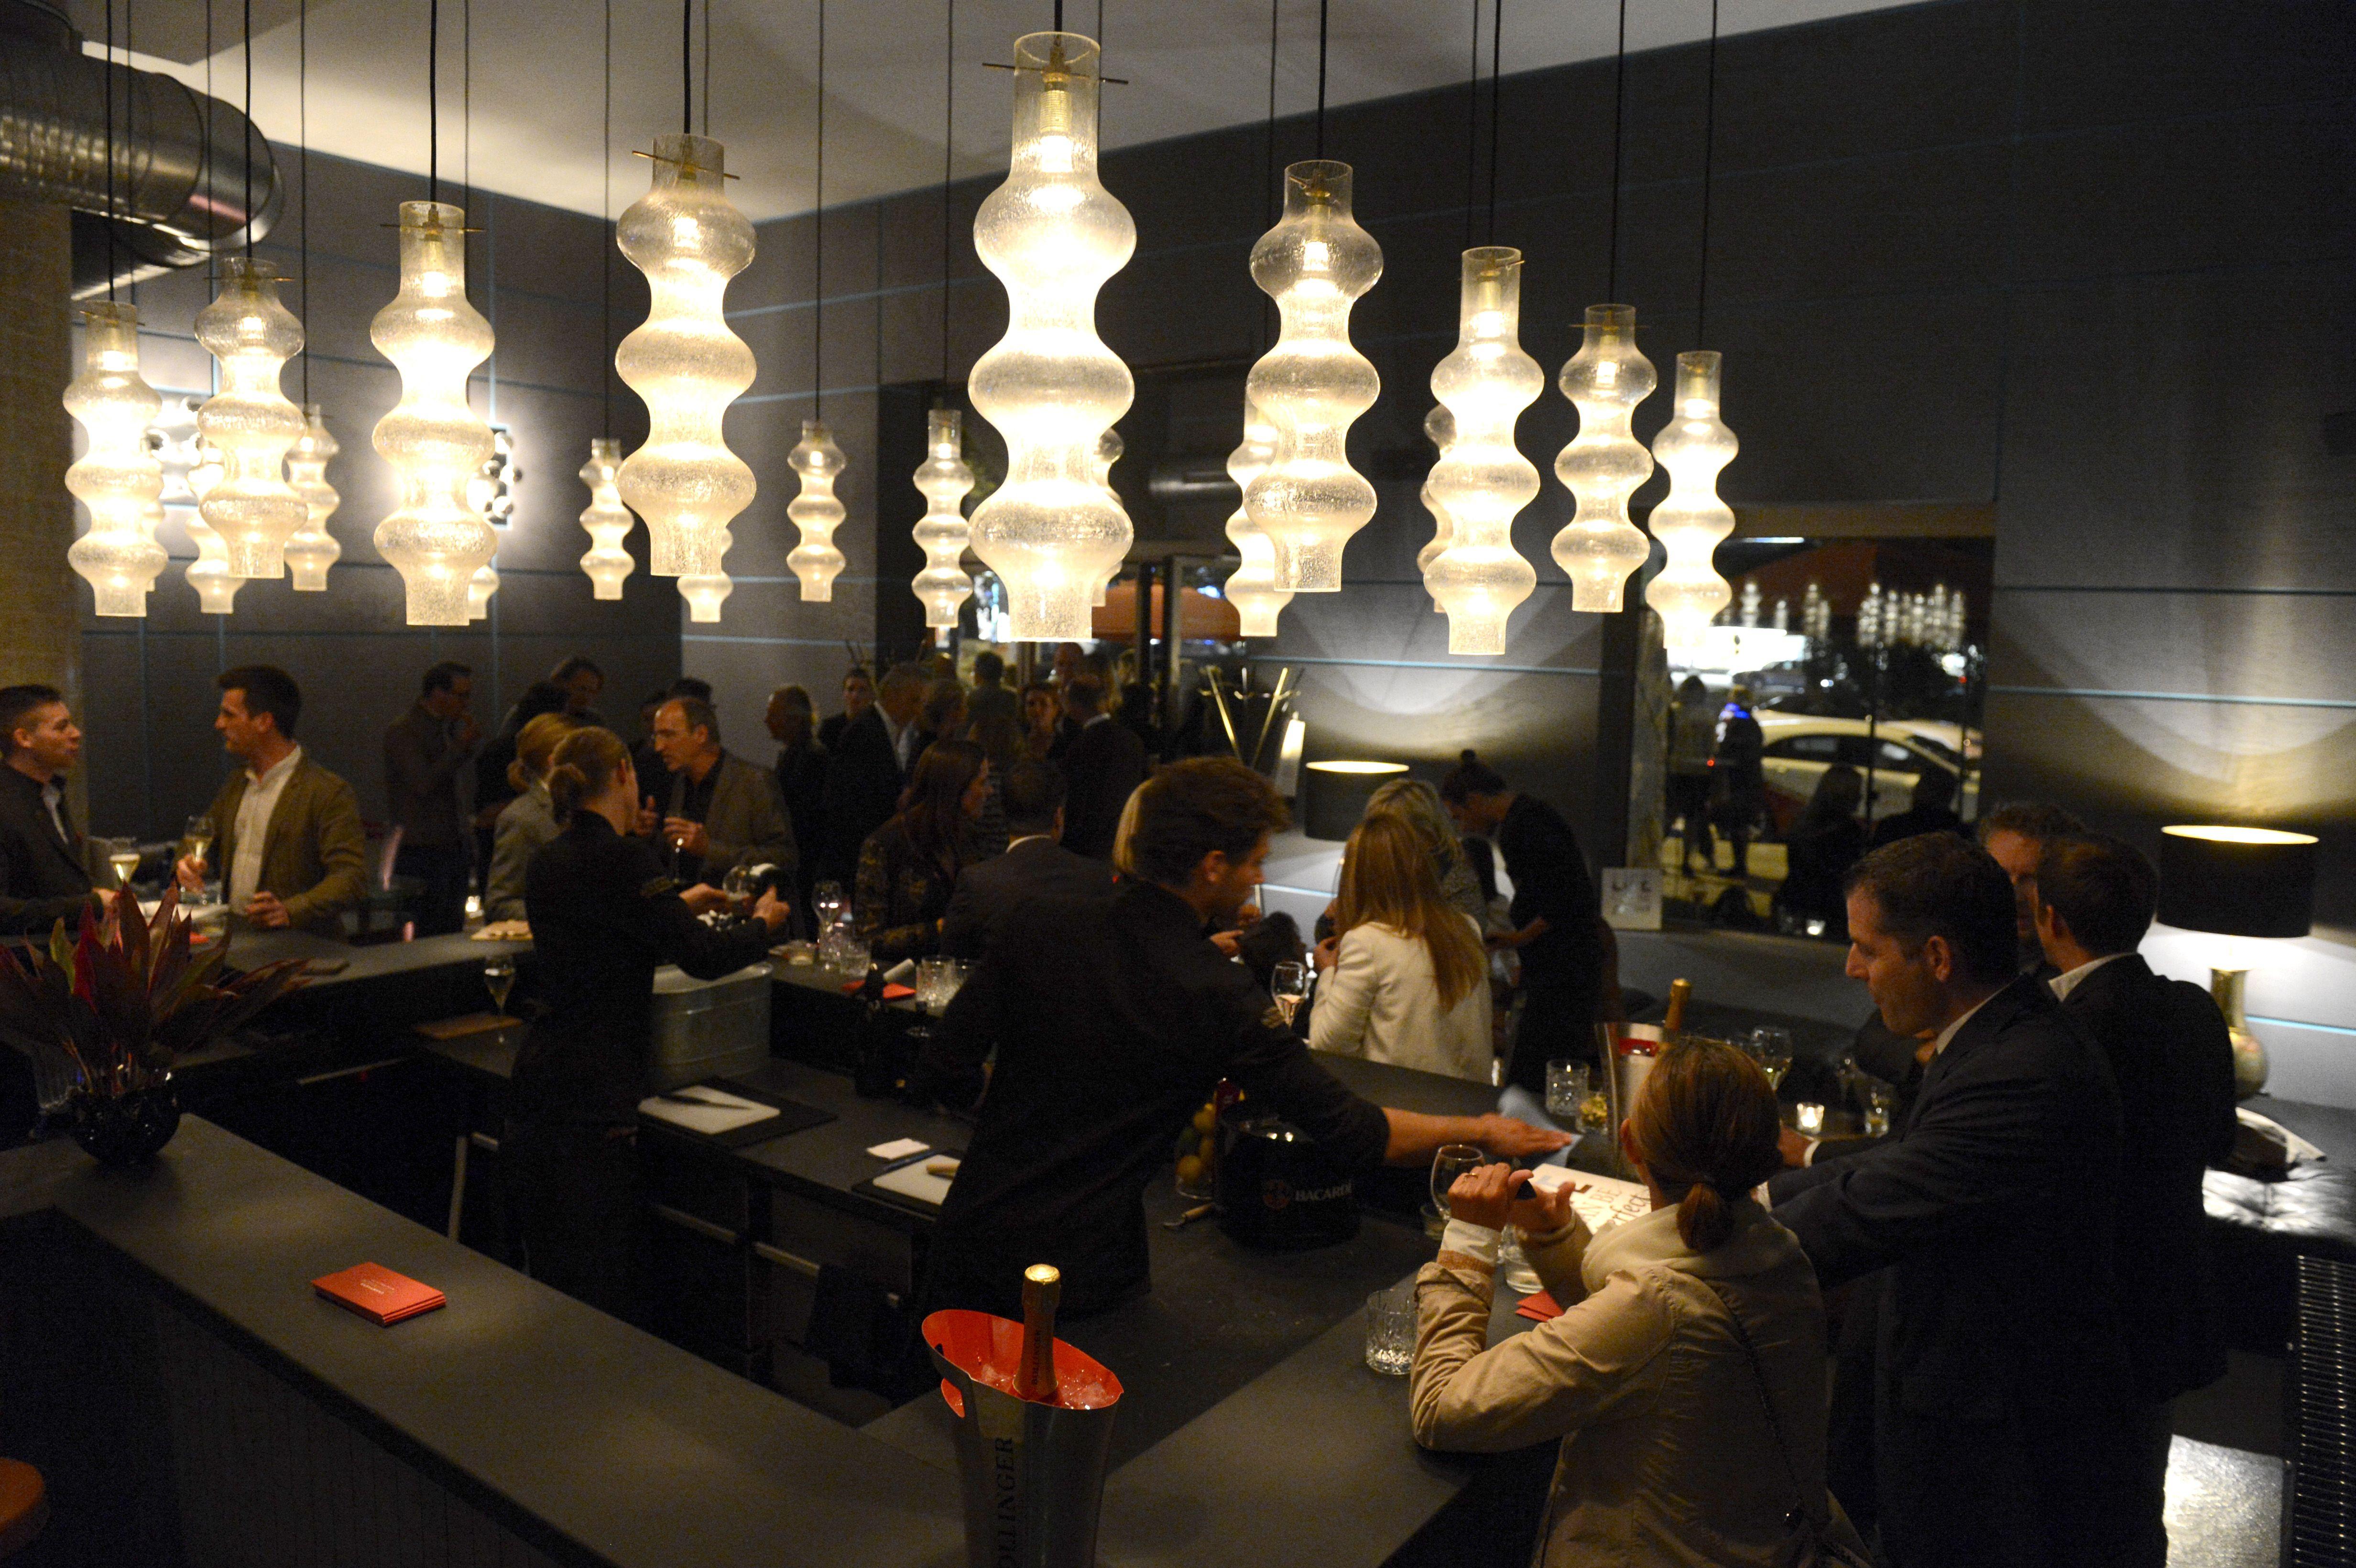 fantom new bar in the centre of munich municlove caf s bars l den pinterest m nchen. Black Bedroom Furniture Sets. Home Design Ideas